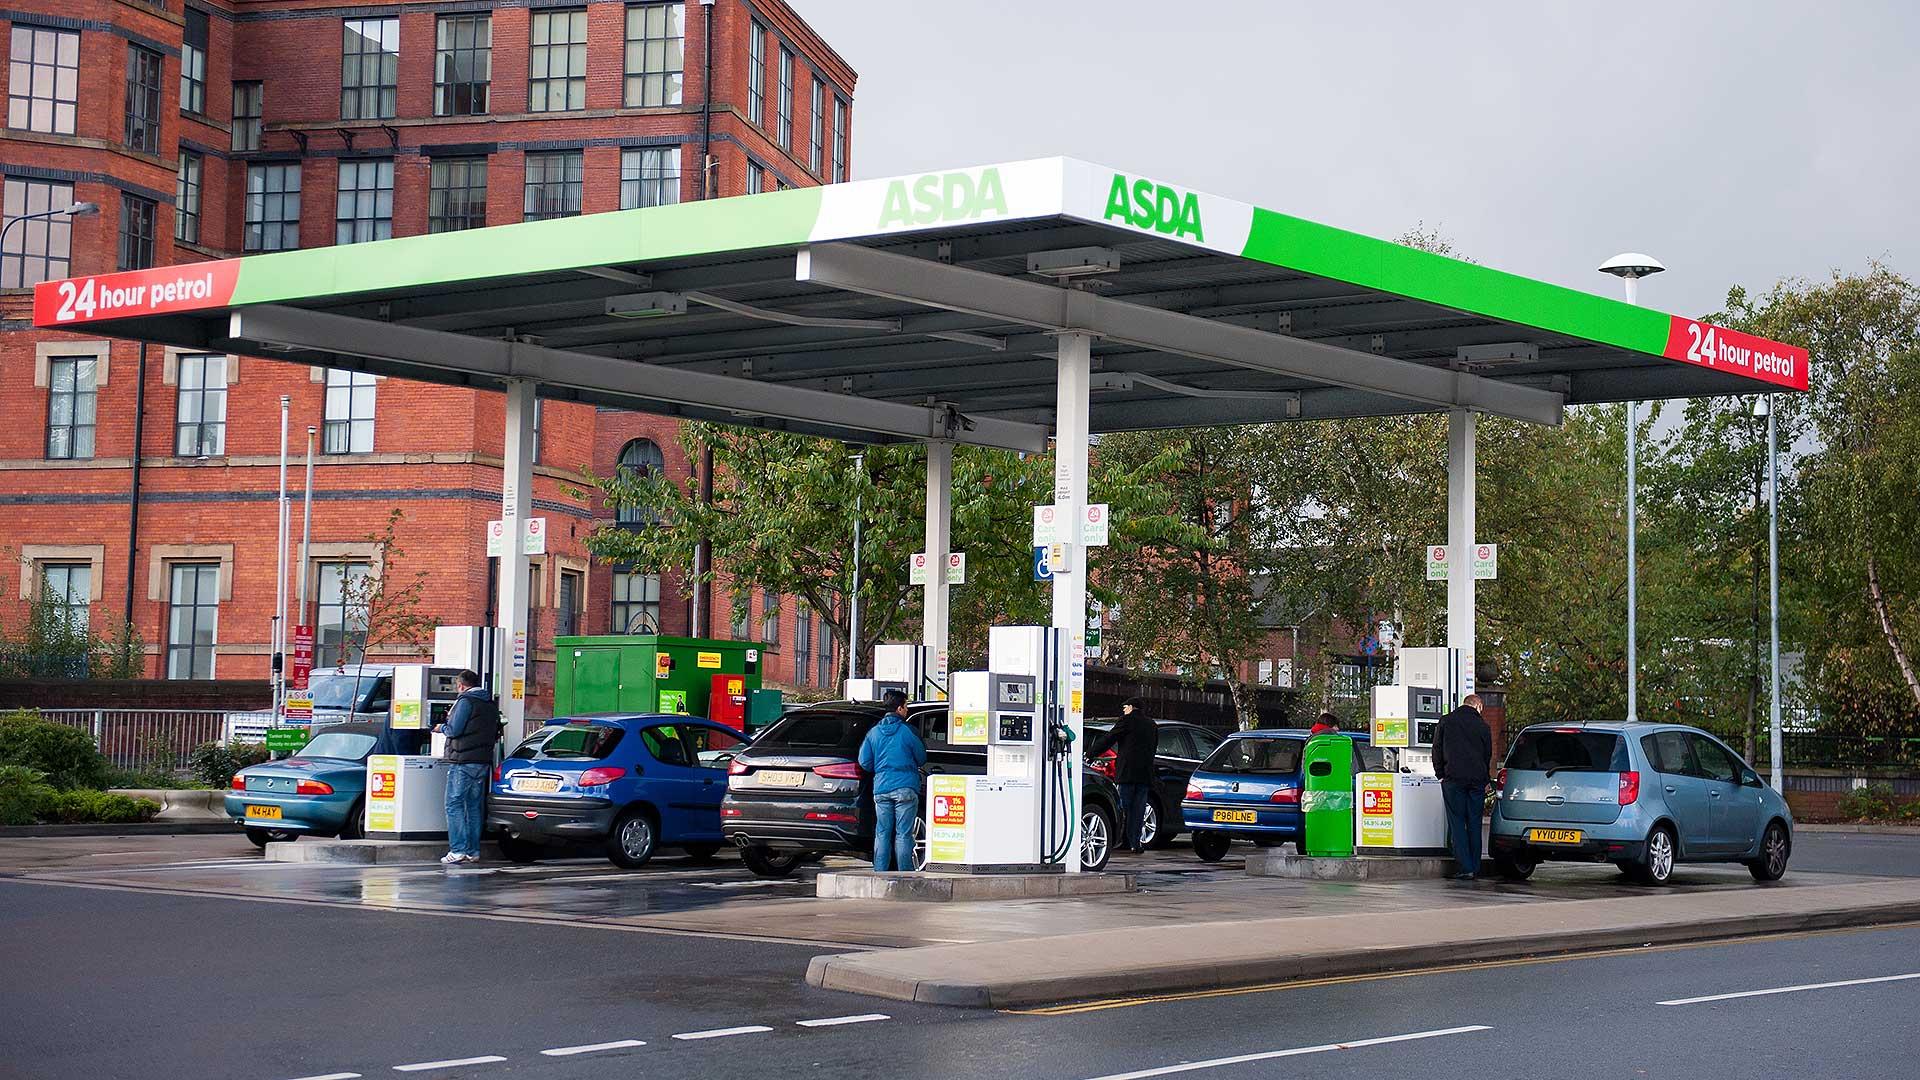 Asda filling station forecourt